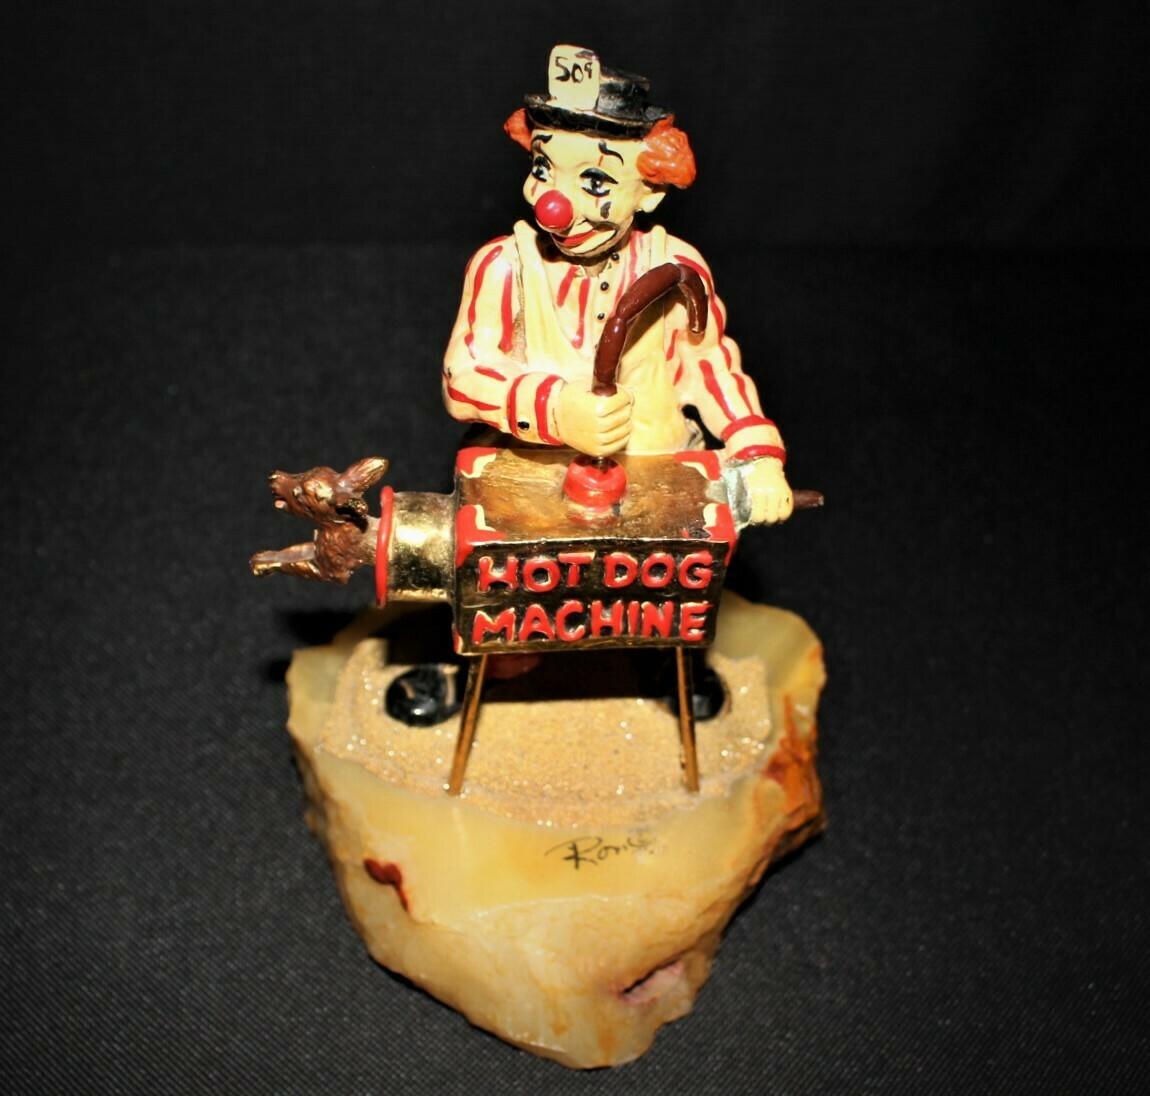 1980 Ron Lee Hot Dog Machine Hand Painted 24kt. Clown Sculpture Figurine, Signed